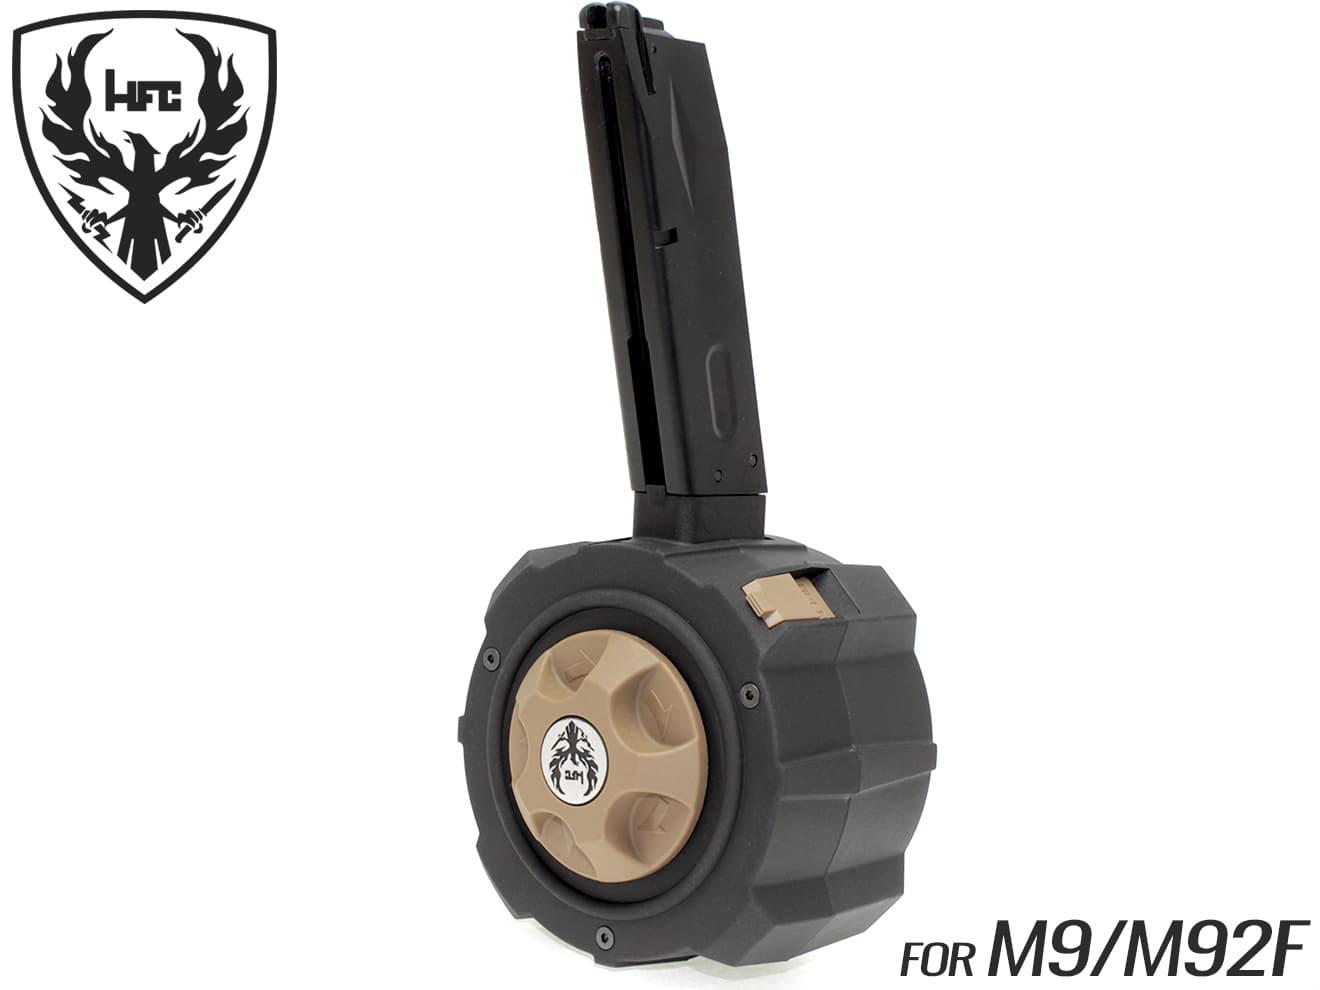 HFC ガスドラムマガジン 145Rds M9/M92F用◆BK/DE 東京マルイ ガスブロ M9/M92Fシリーズ対応 樽型マガジン BB弾500発付属 ガス容量超増大